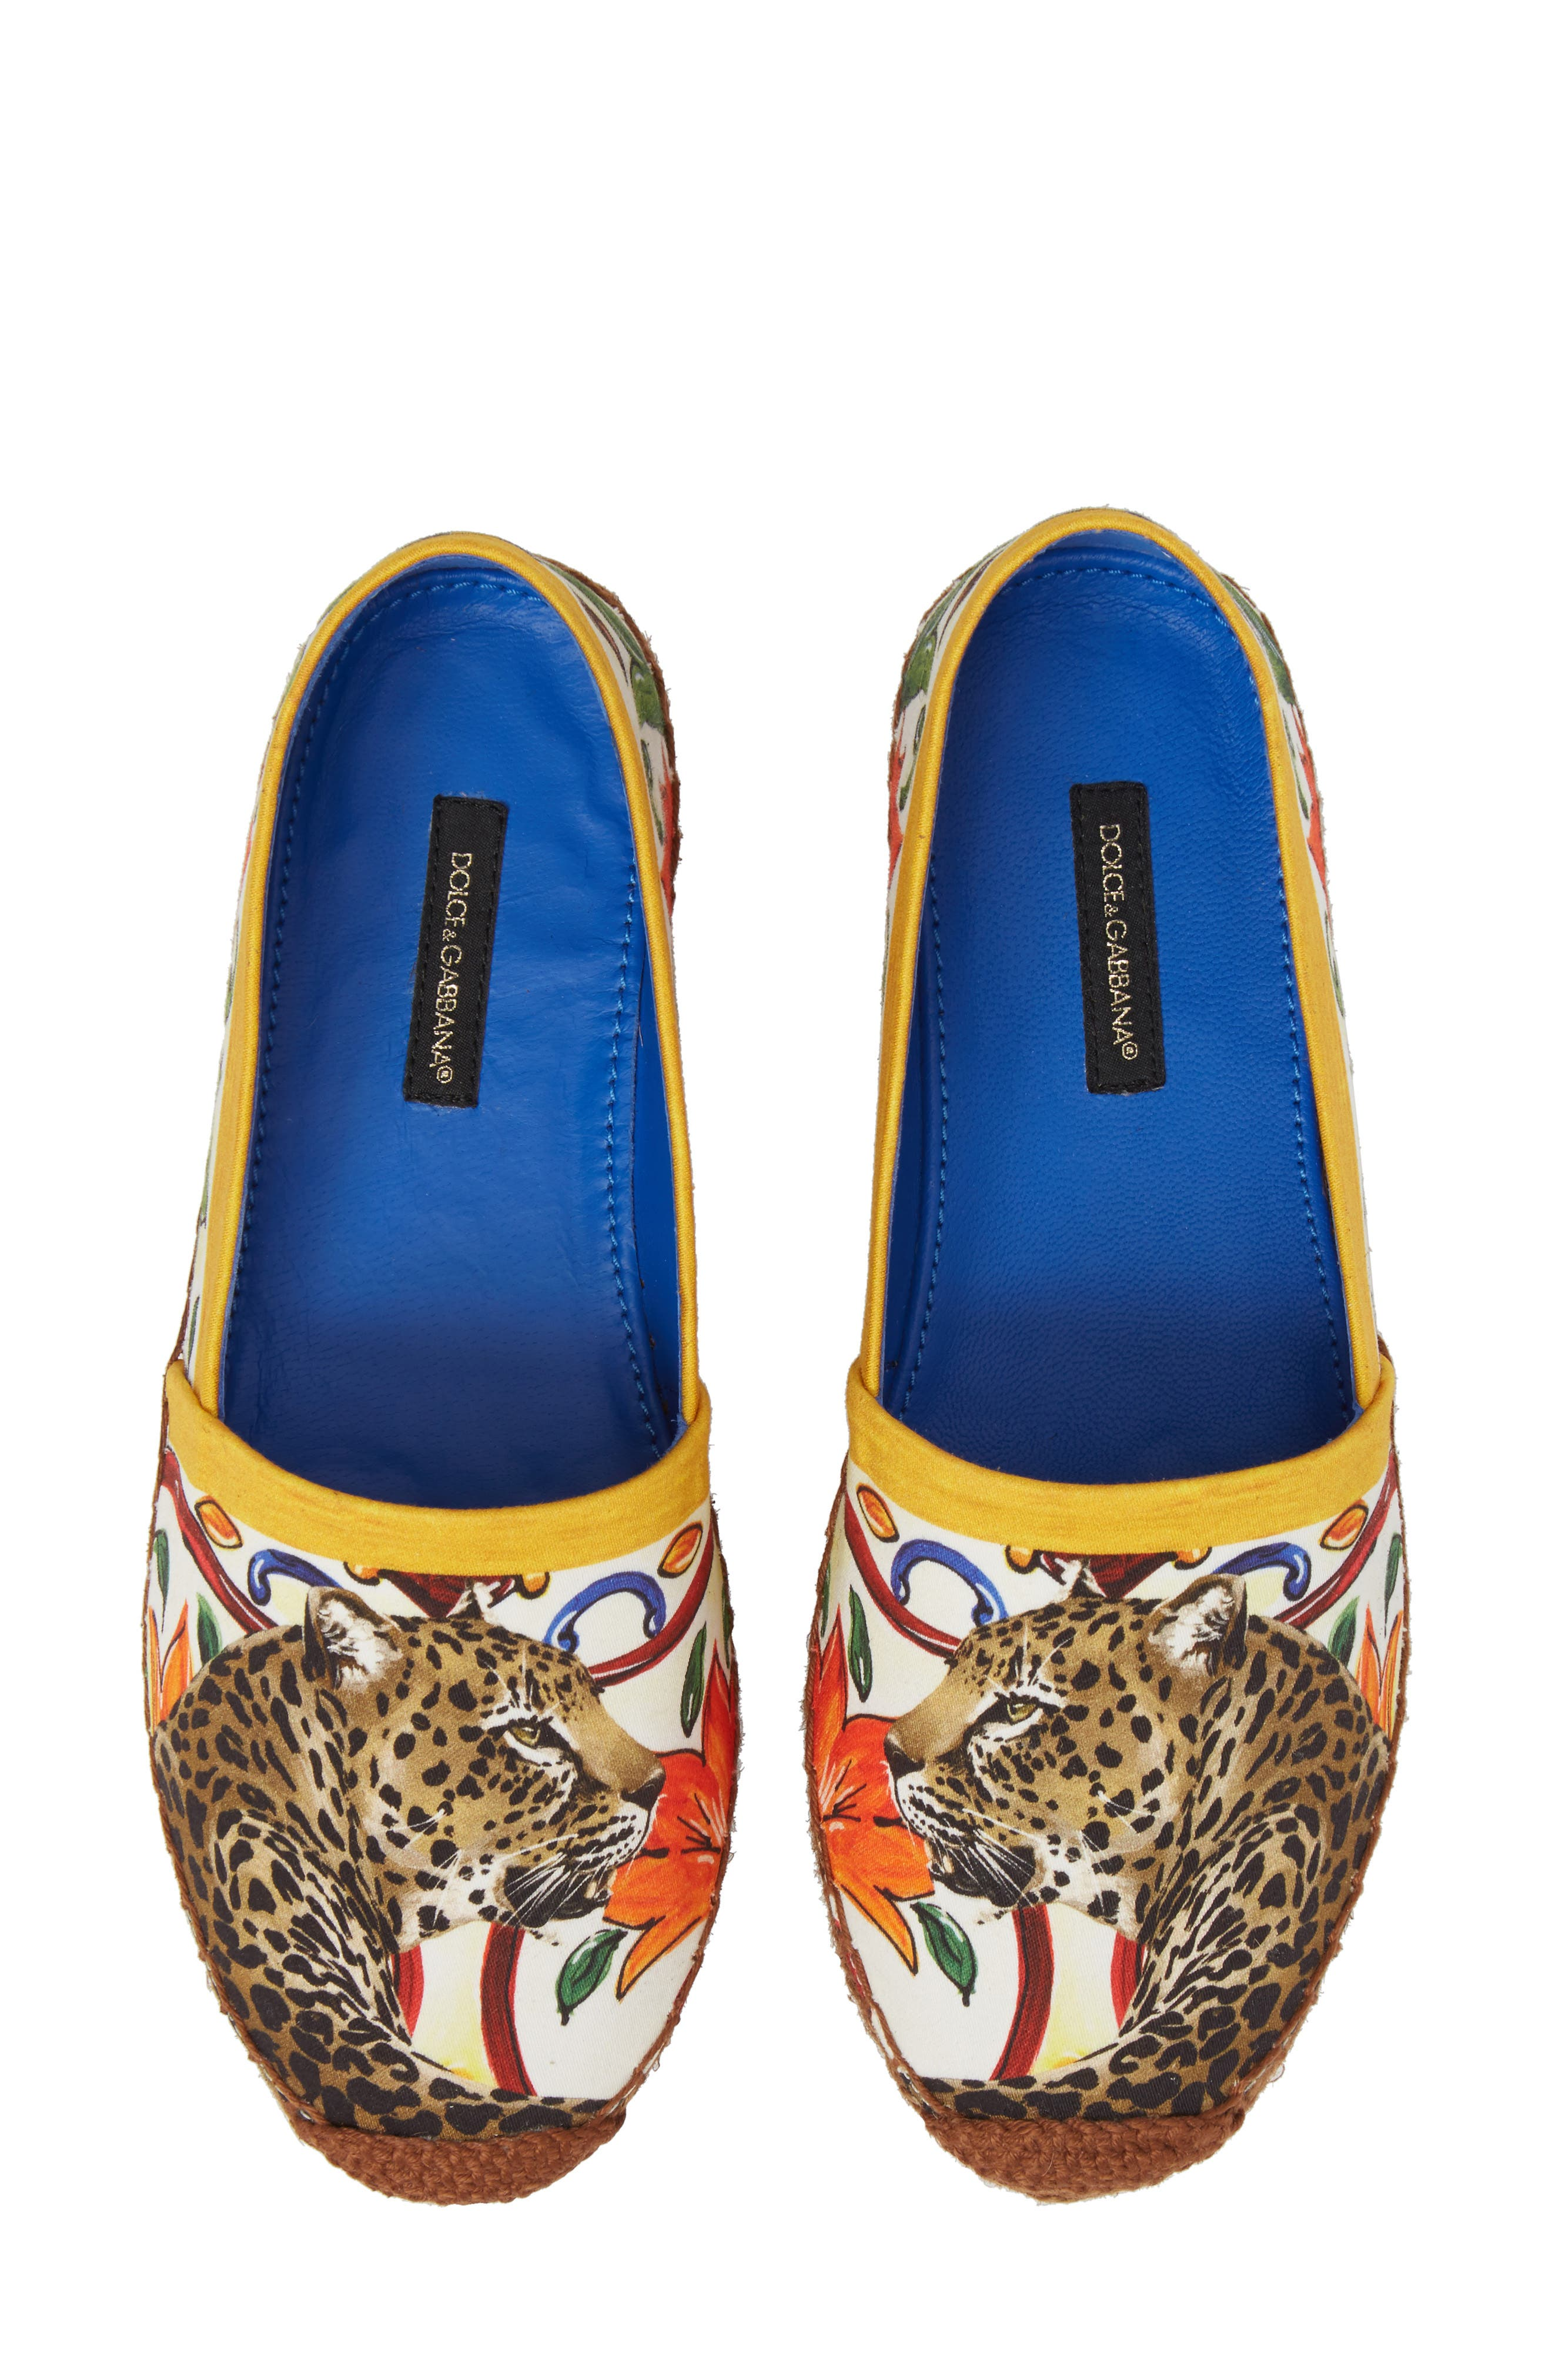 Dolce&Gabbana Leopard Espadrile Slip-On (Women)